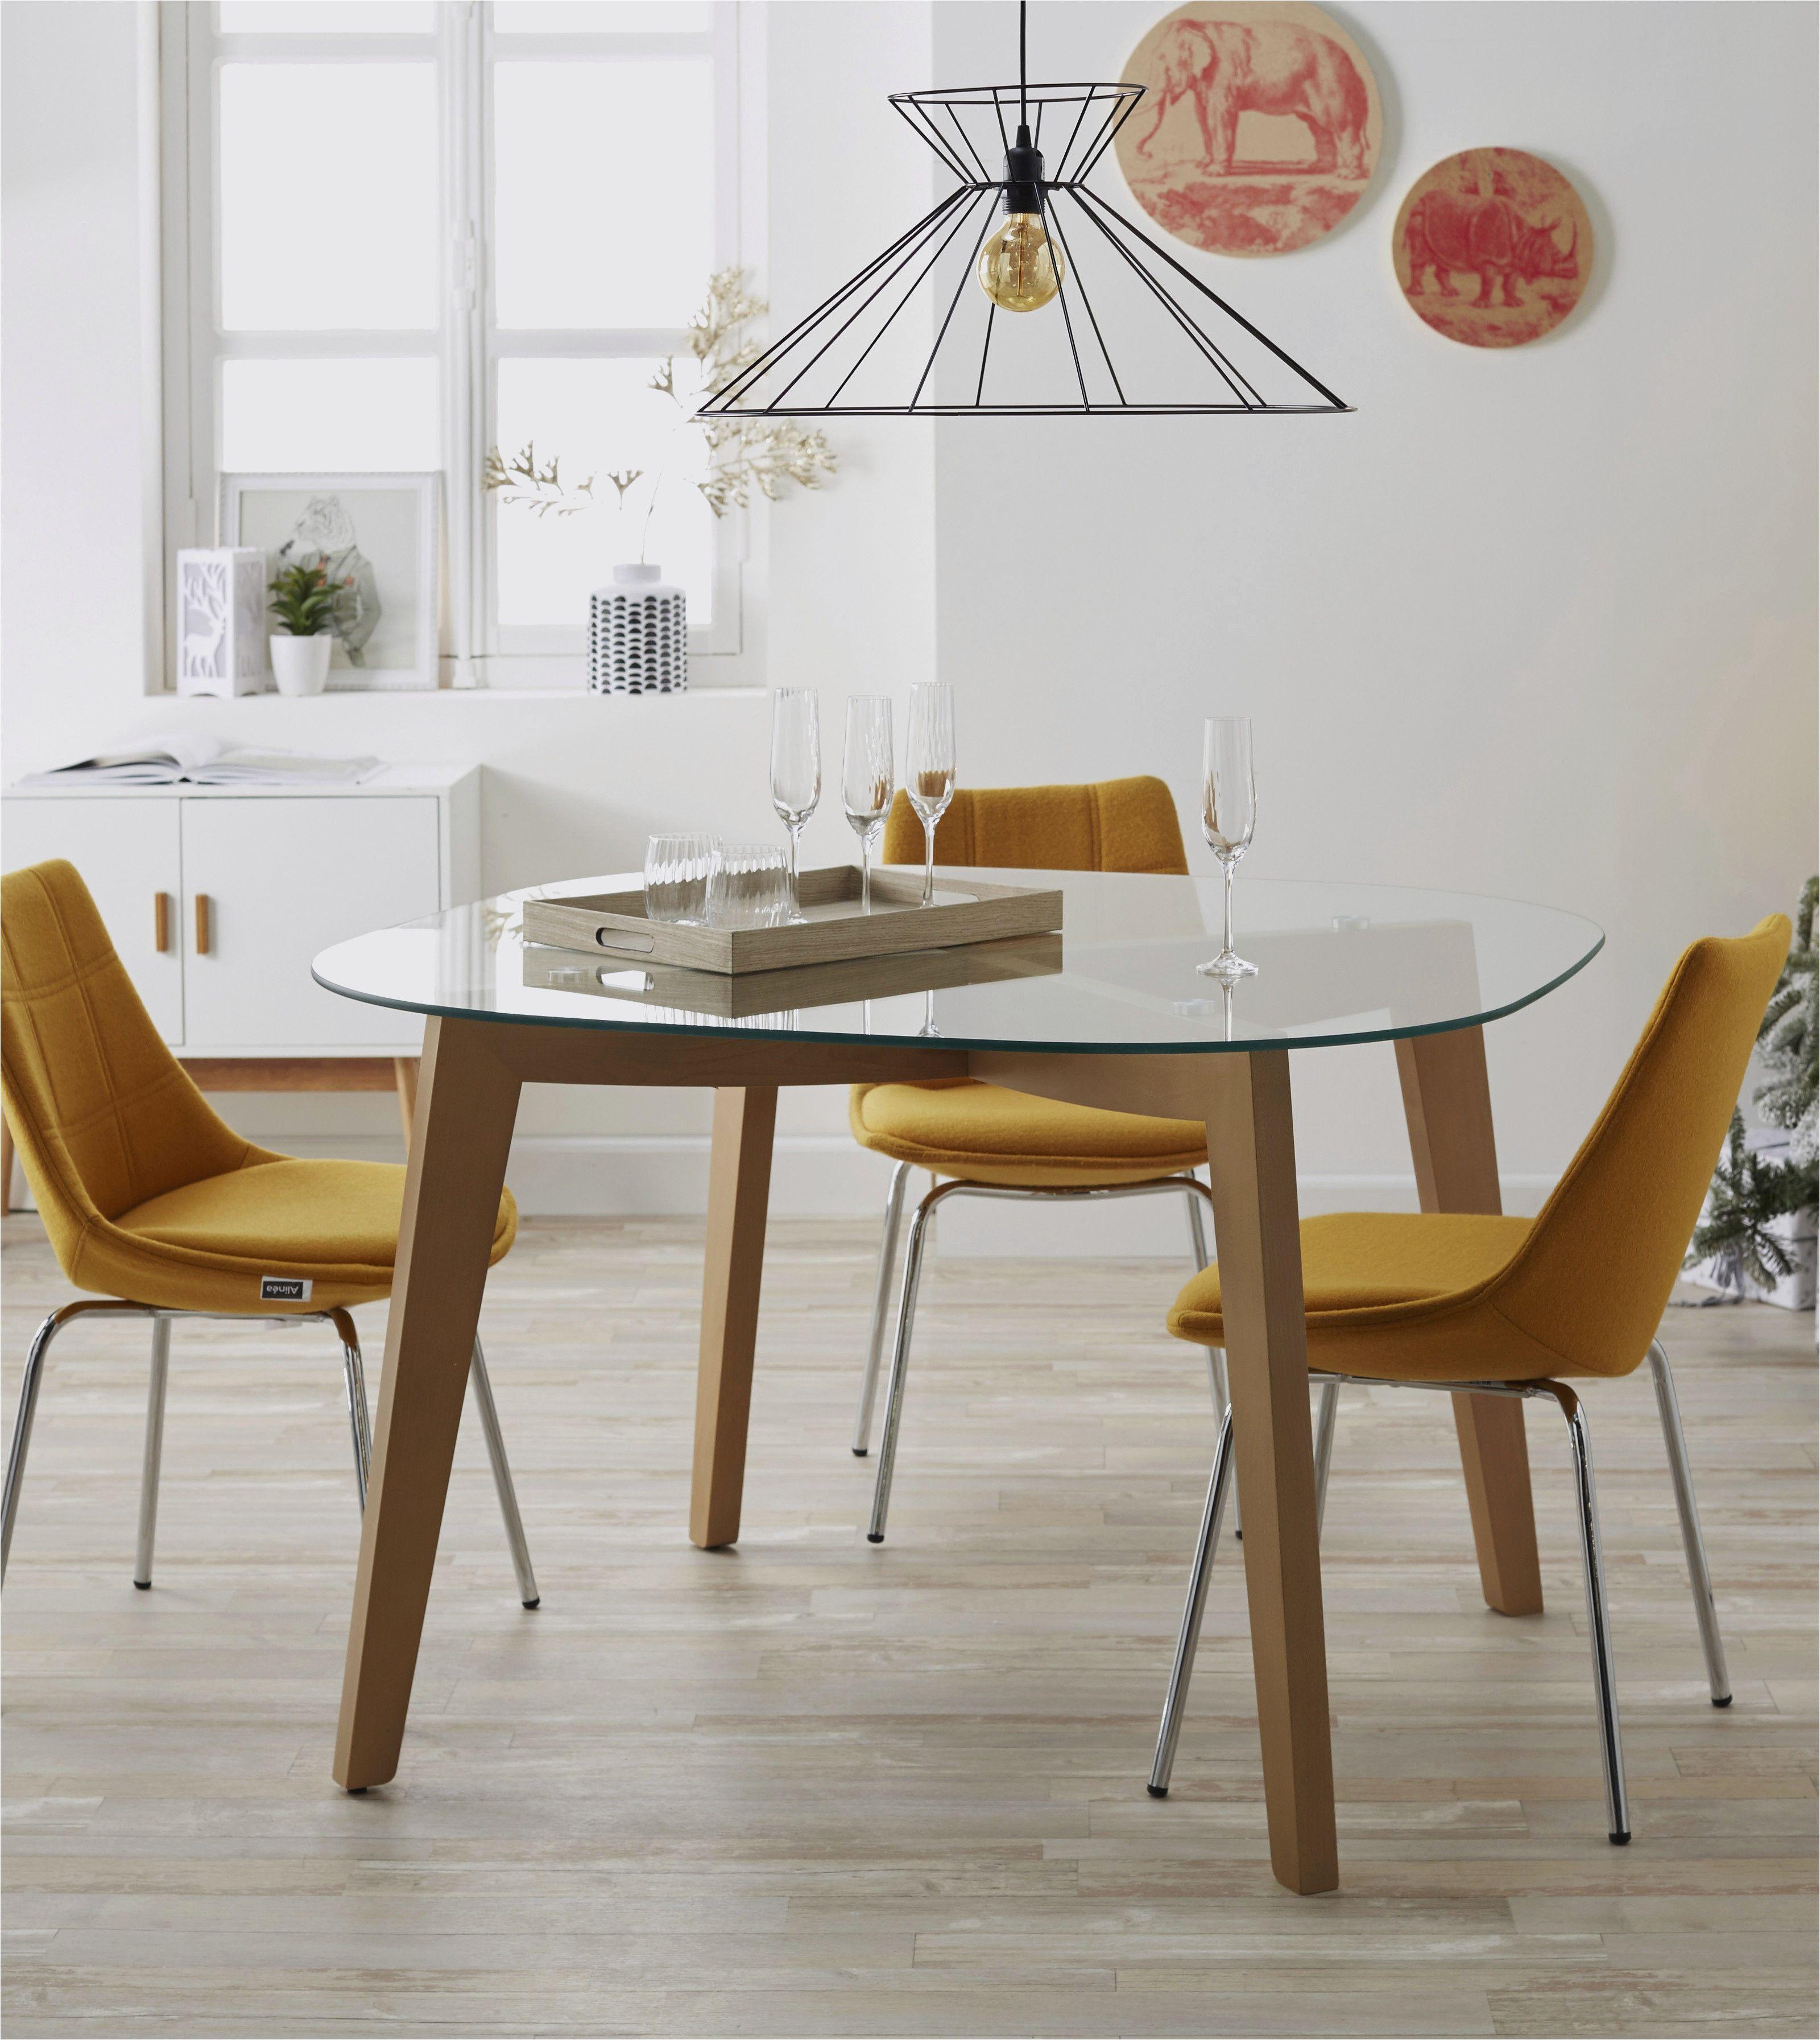 Luxury Le Bon Coin Beauvais Table Salle A Manger